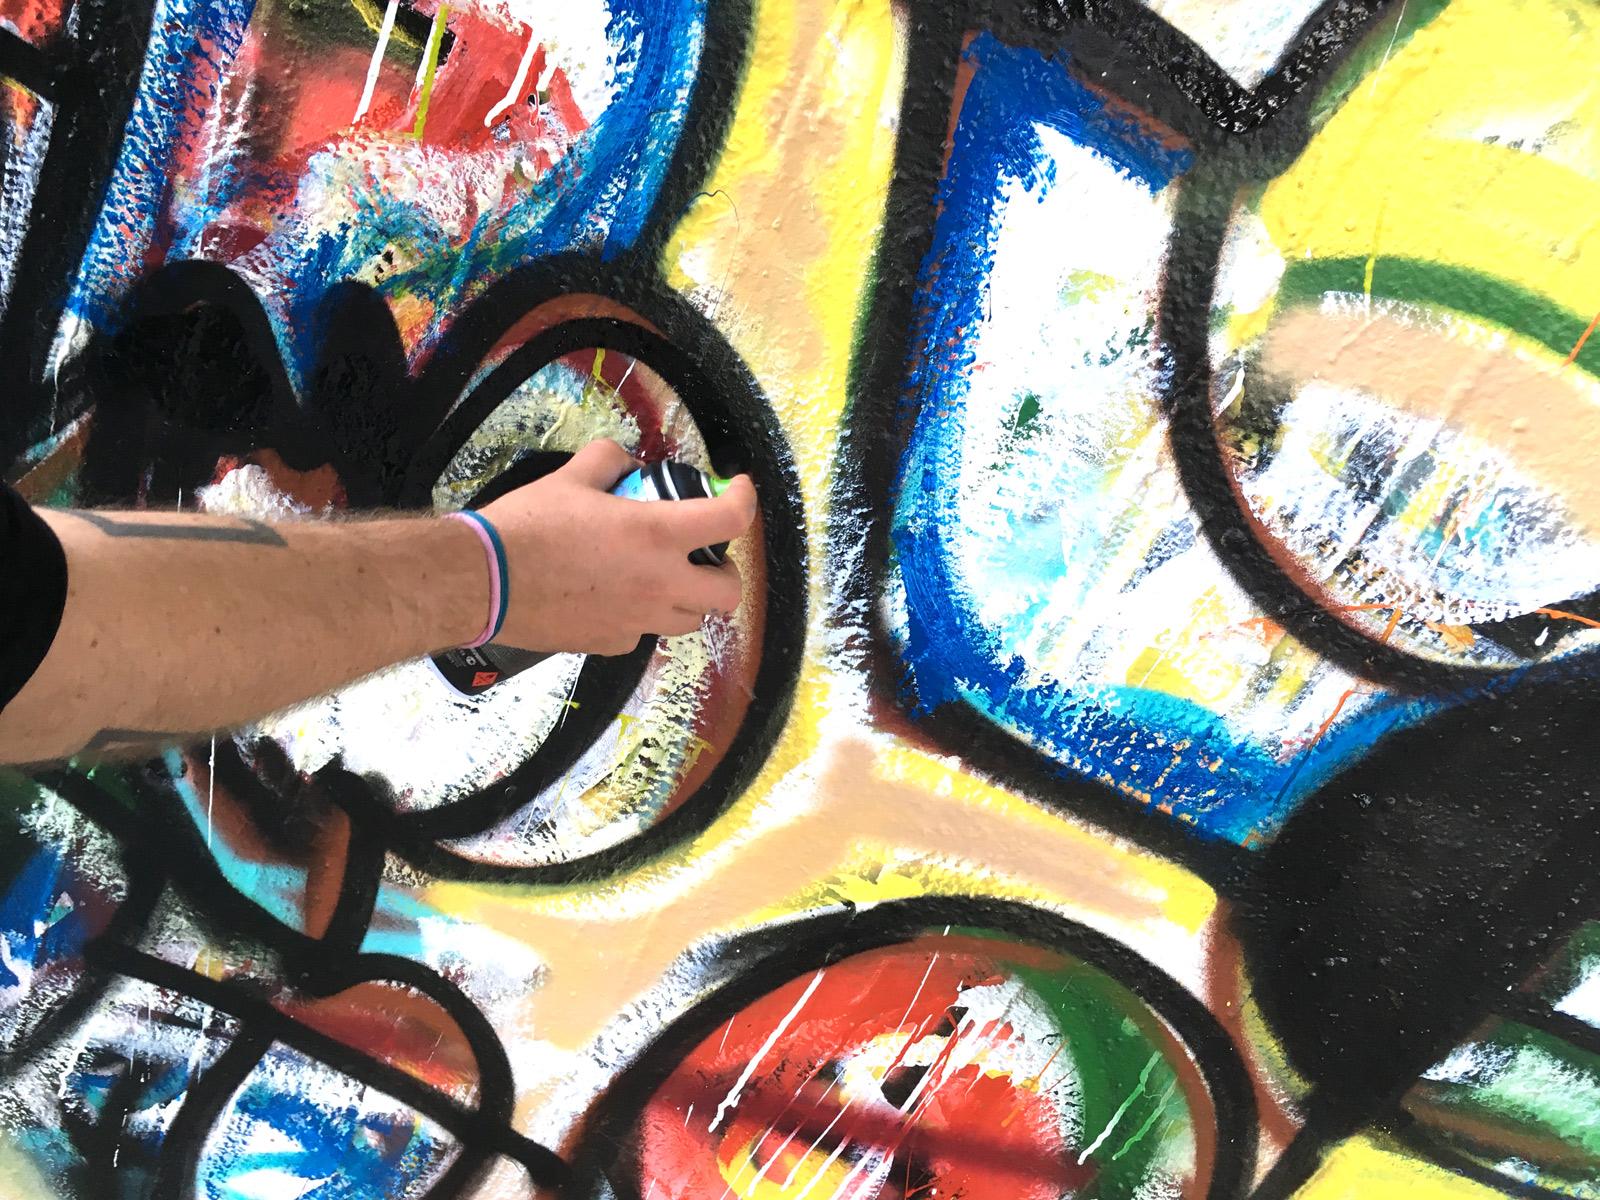 Rob_Adalierd_Painting_Vienna_Abstract_Contemporary_Street_art_8.jpg